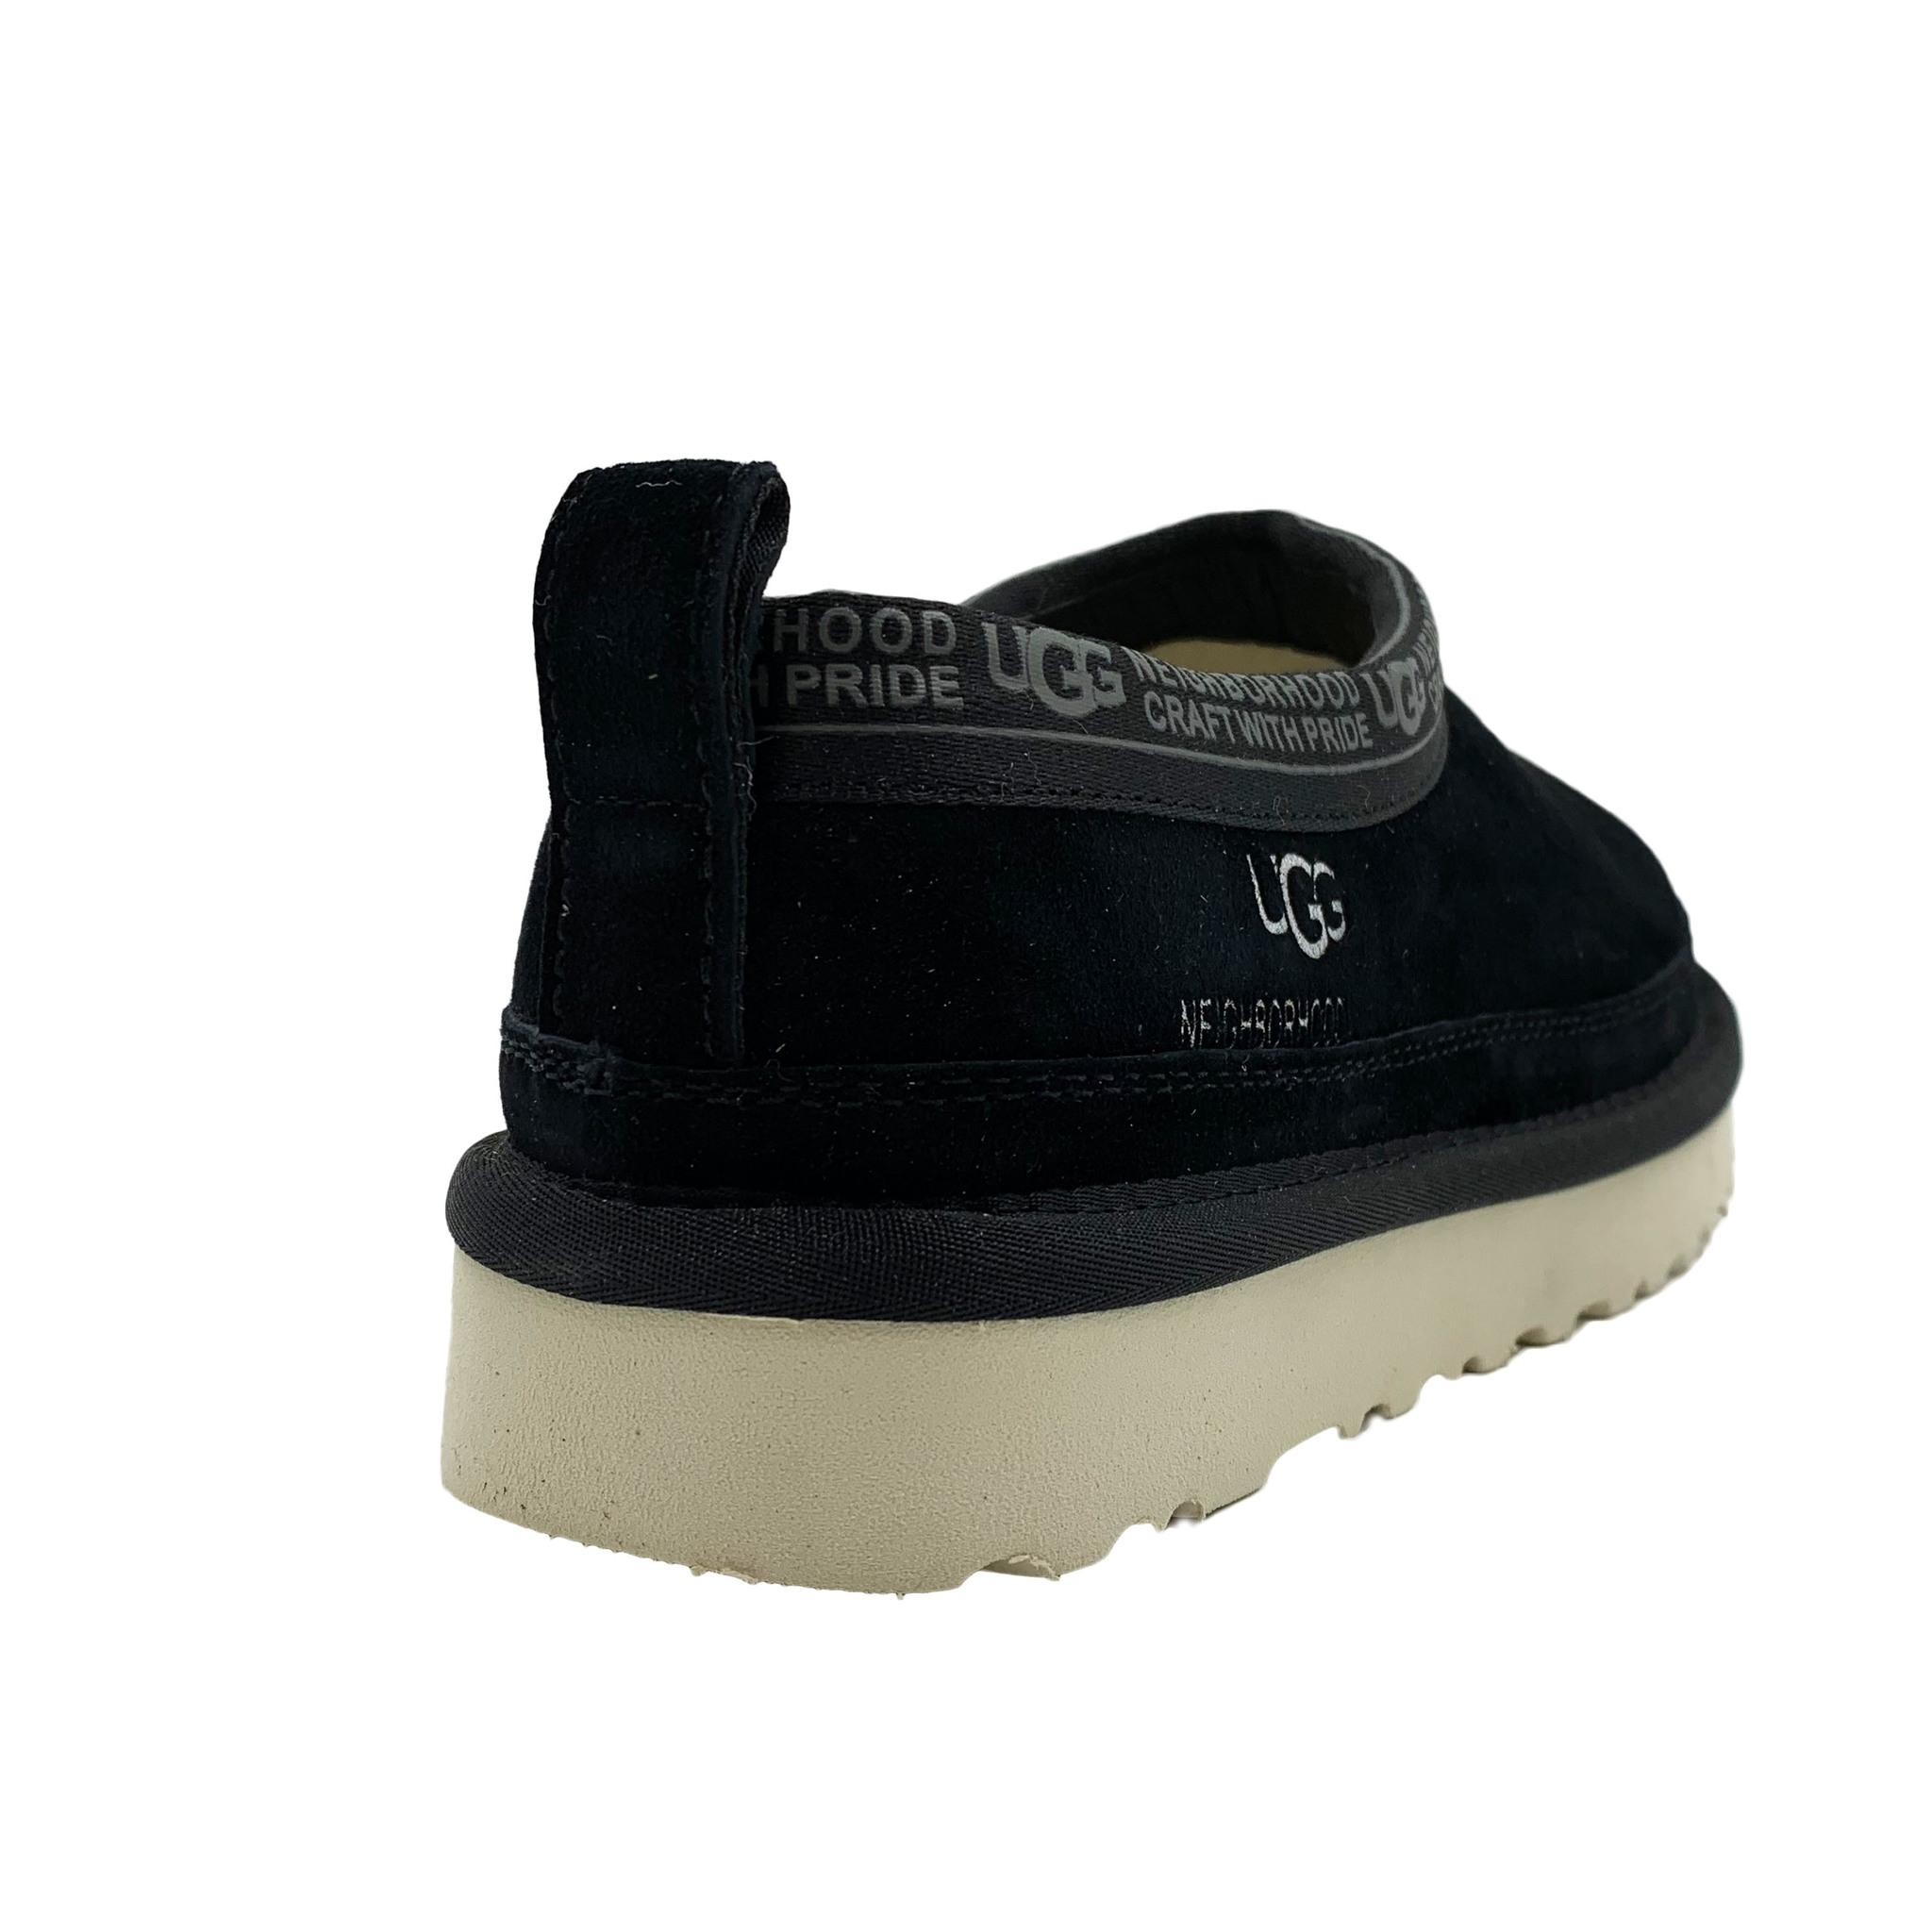 UGG X NEIGHBORHOOD TASMAN BLACK